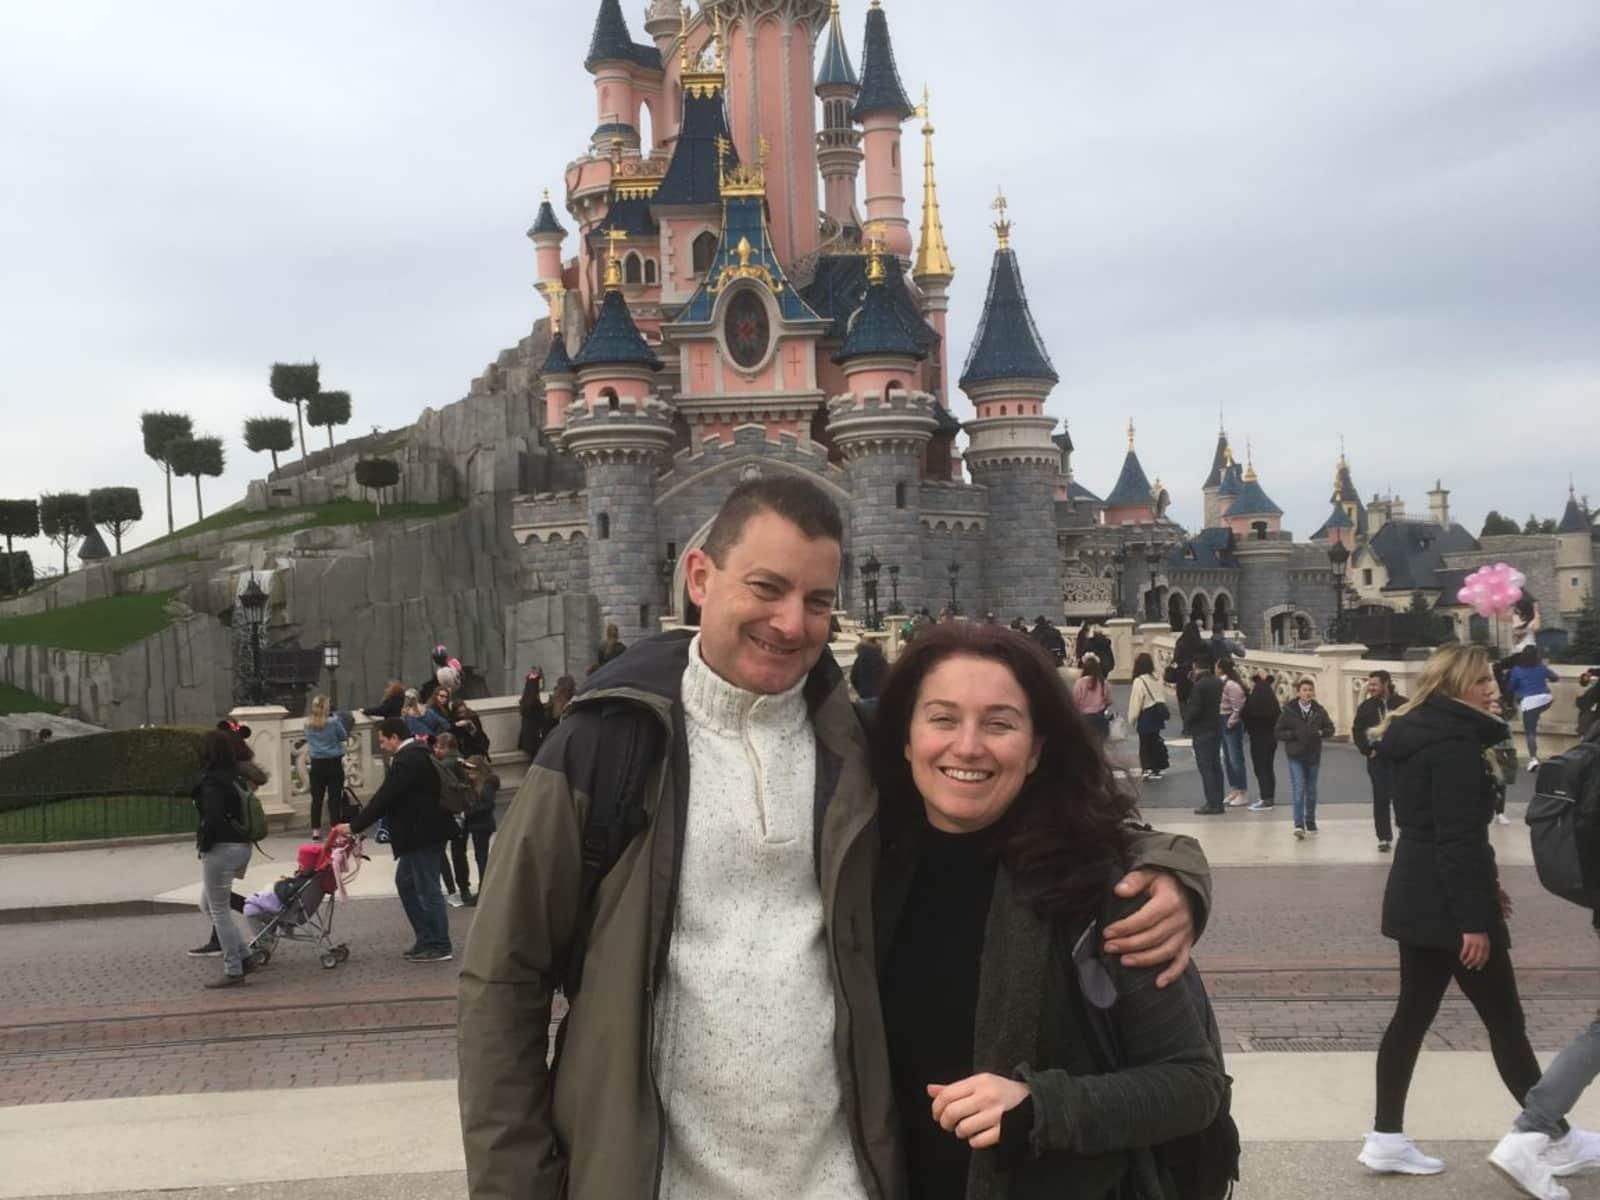 Kallika fiona & Richard from Southampton, United Kingdom